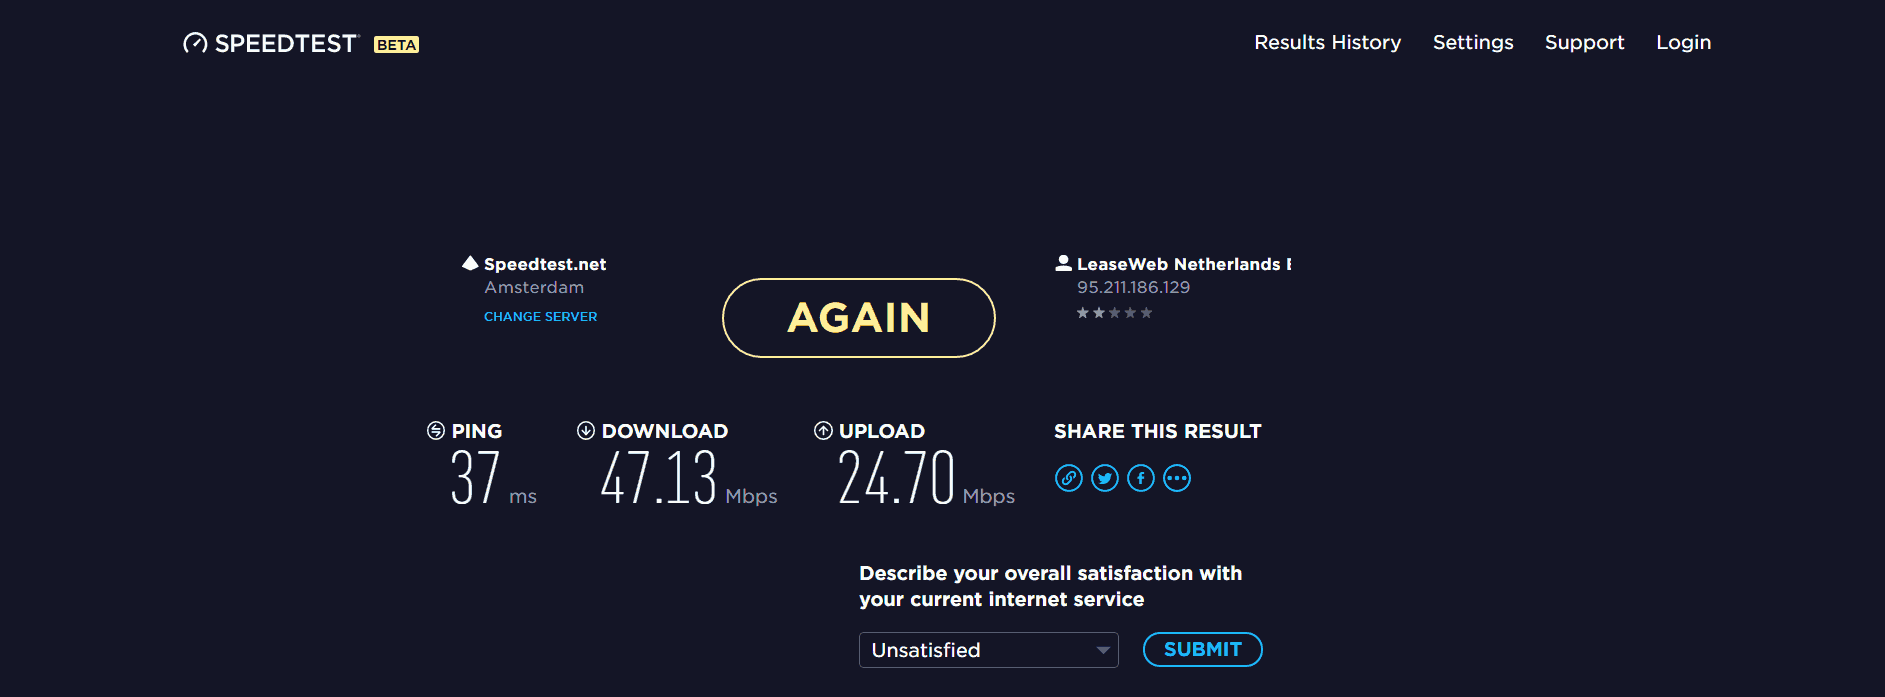 VPN Unlimited download speed